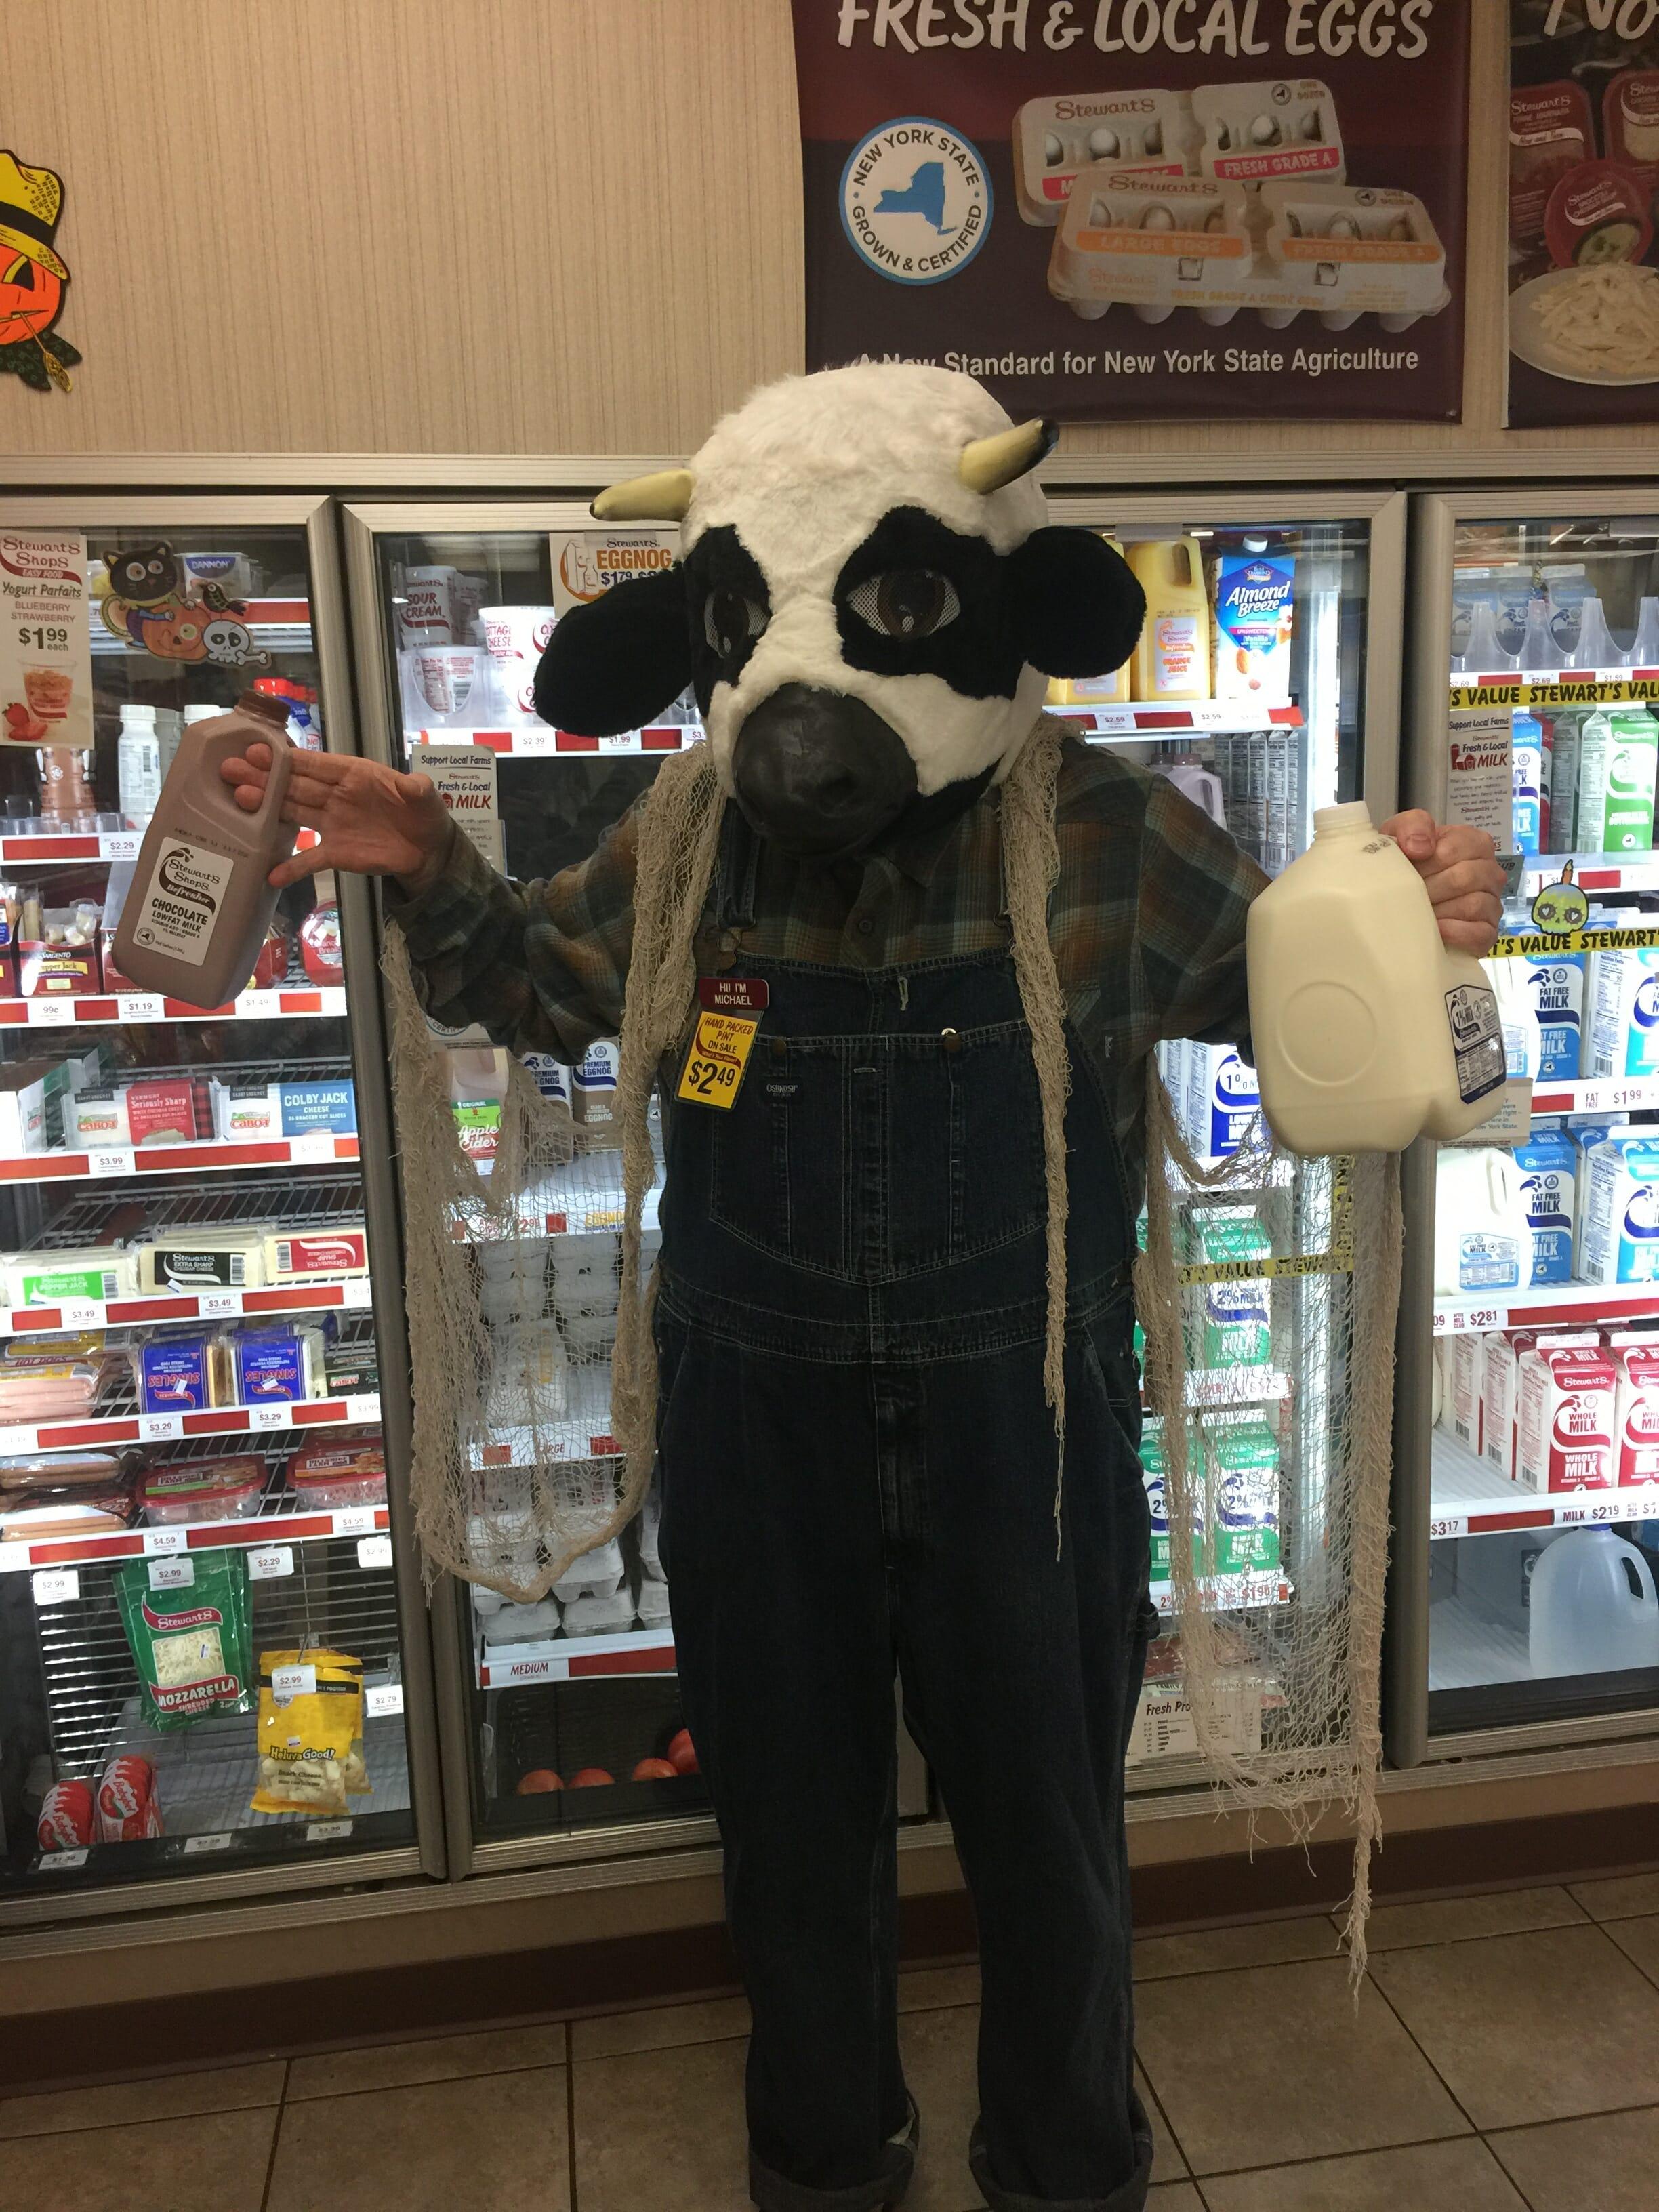 cow getting milk